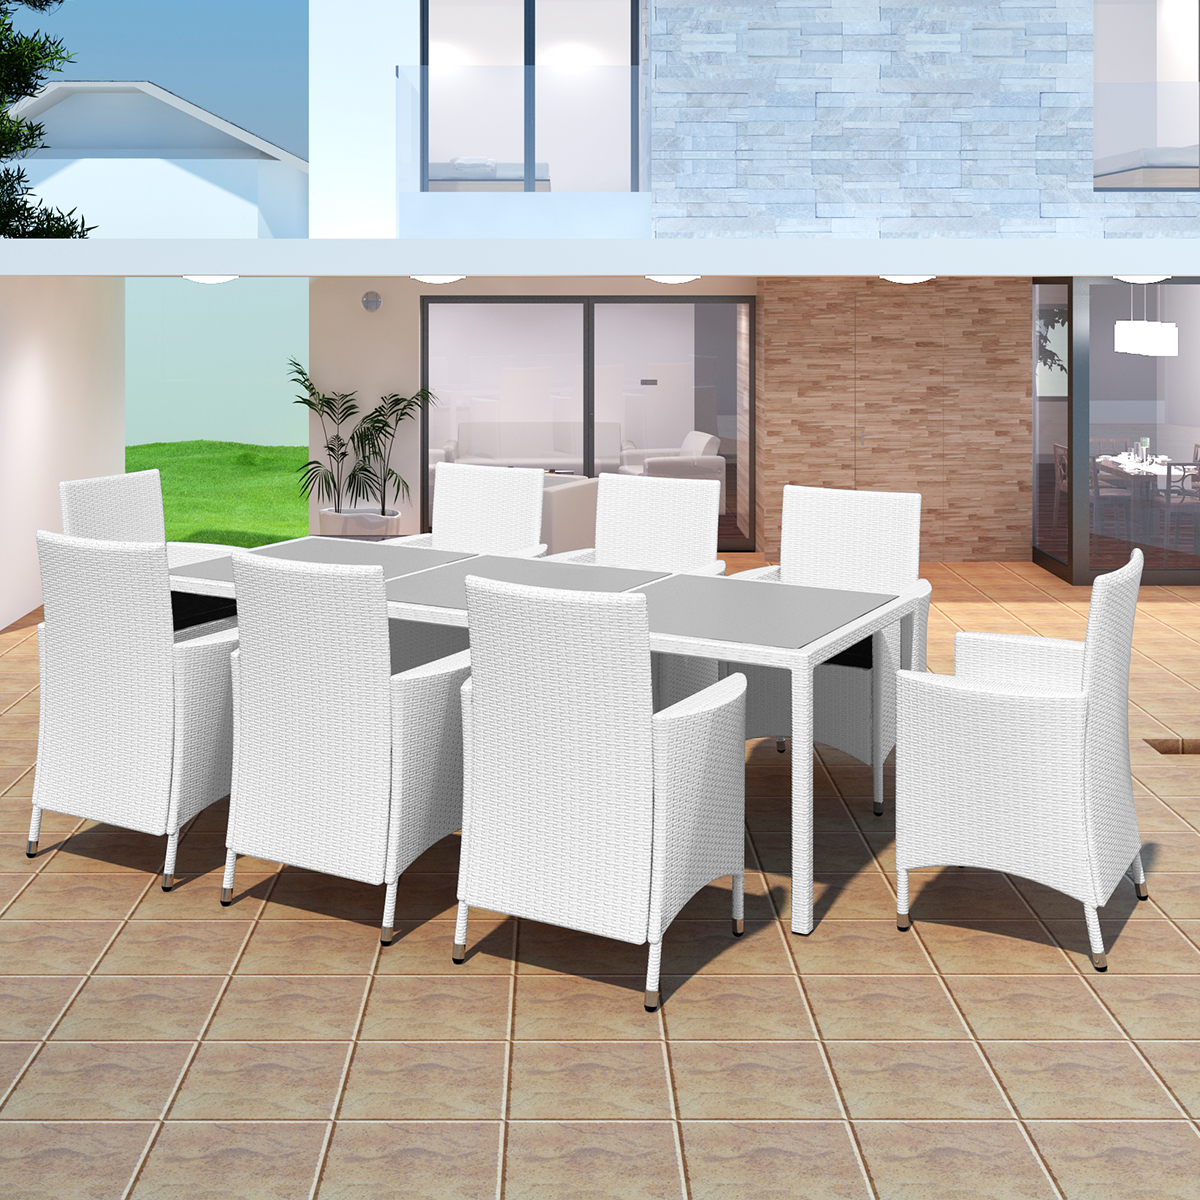 salon de jardin 8 places en poly rotin 4 coloris. Black Bedroom Furniture Sets. Home Design Ideas